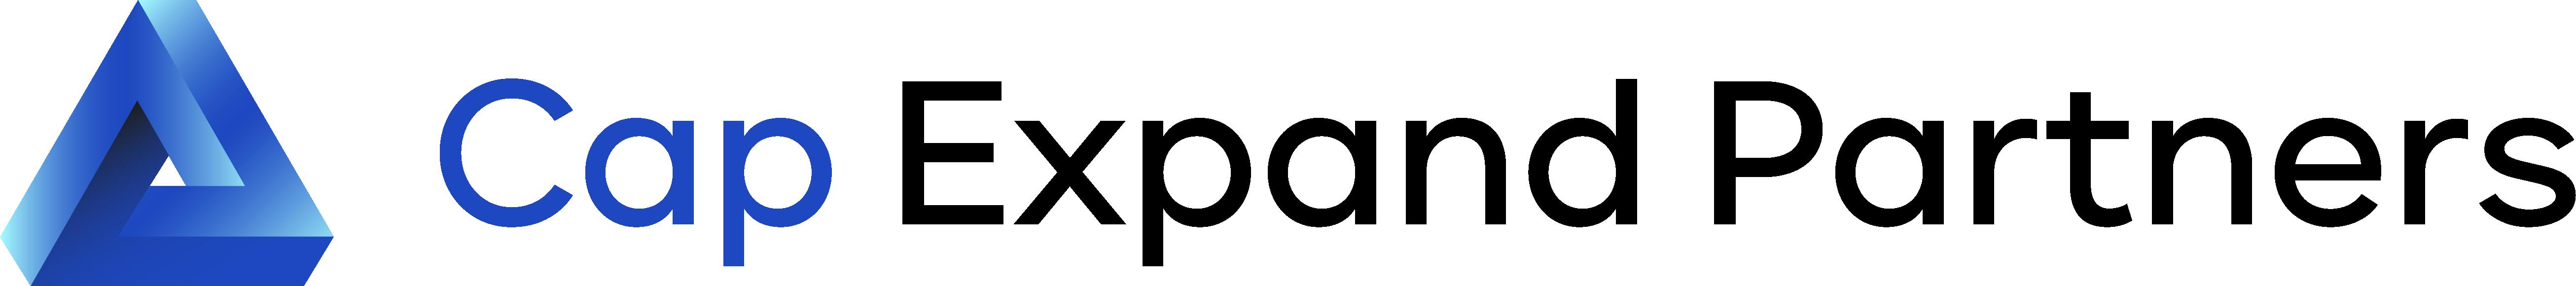 Cap Expand Partners Cap-Expand-Partners-logo About